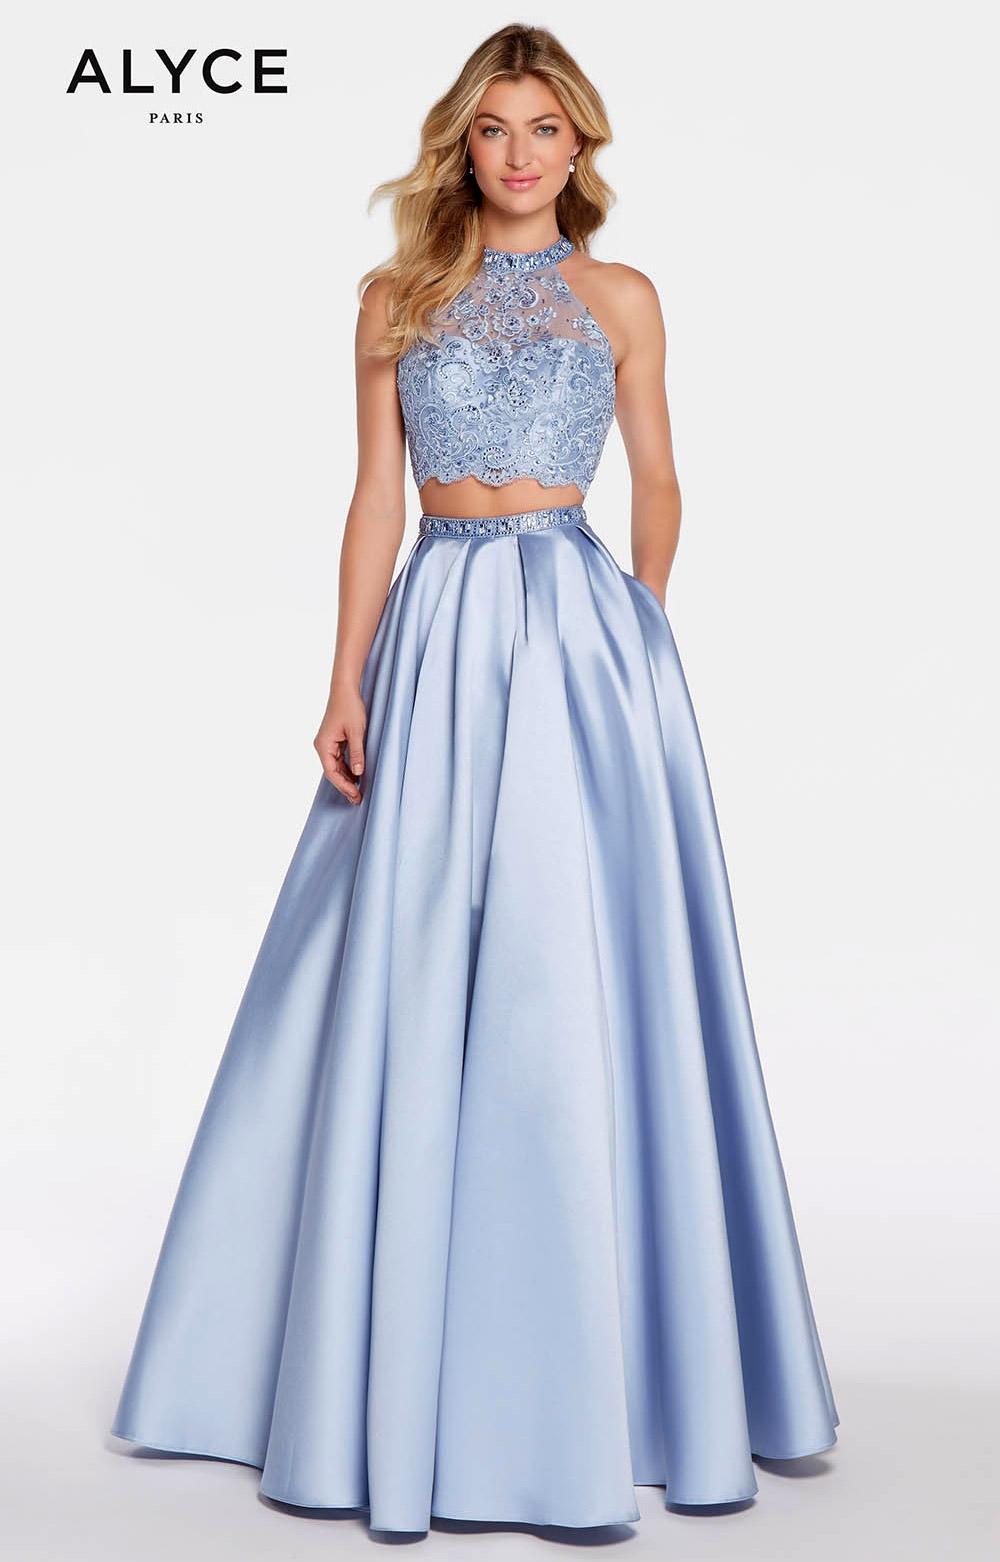 Alyce Paris 1312 Long A Line Mikado 2 Piece Prom Dress